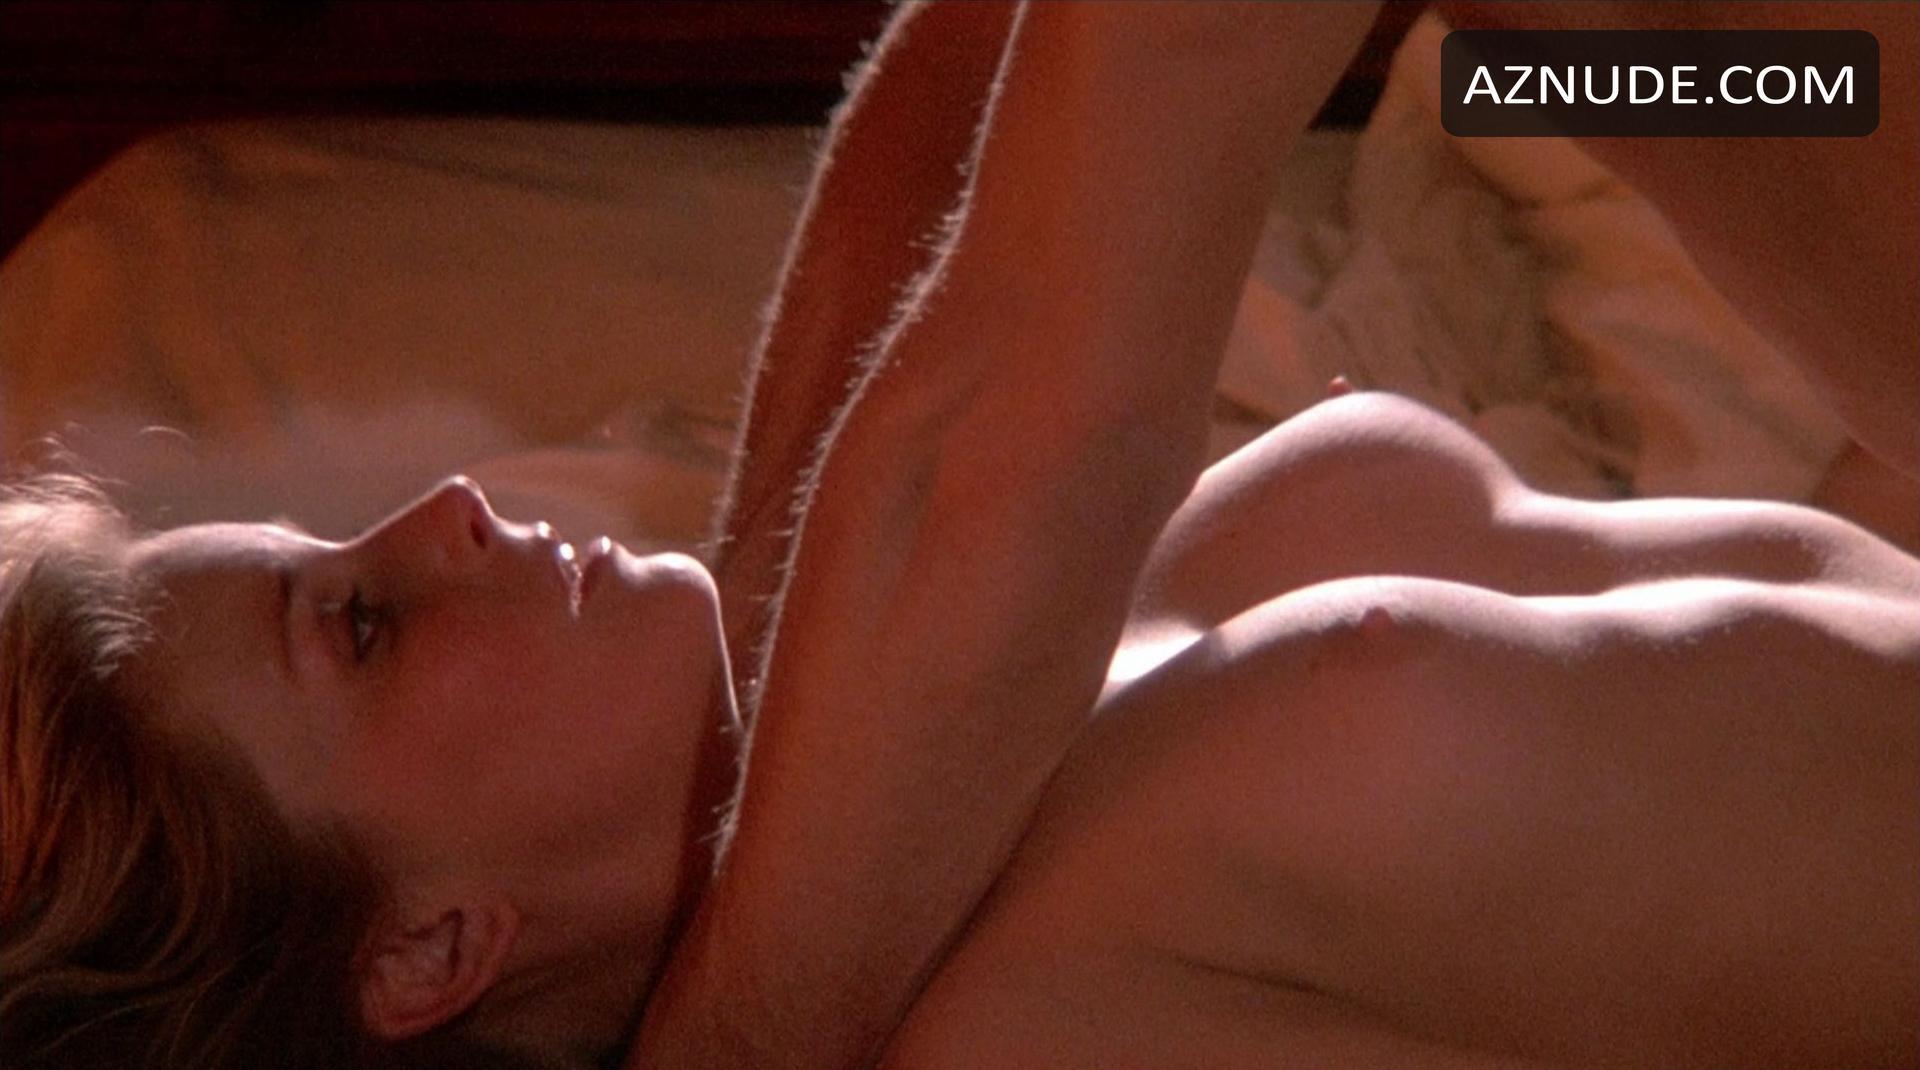 Have removed nudity in the movie bolero are still